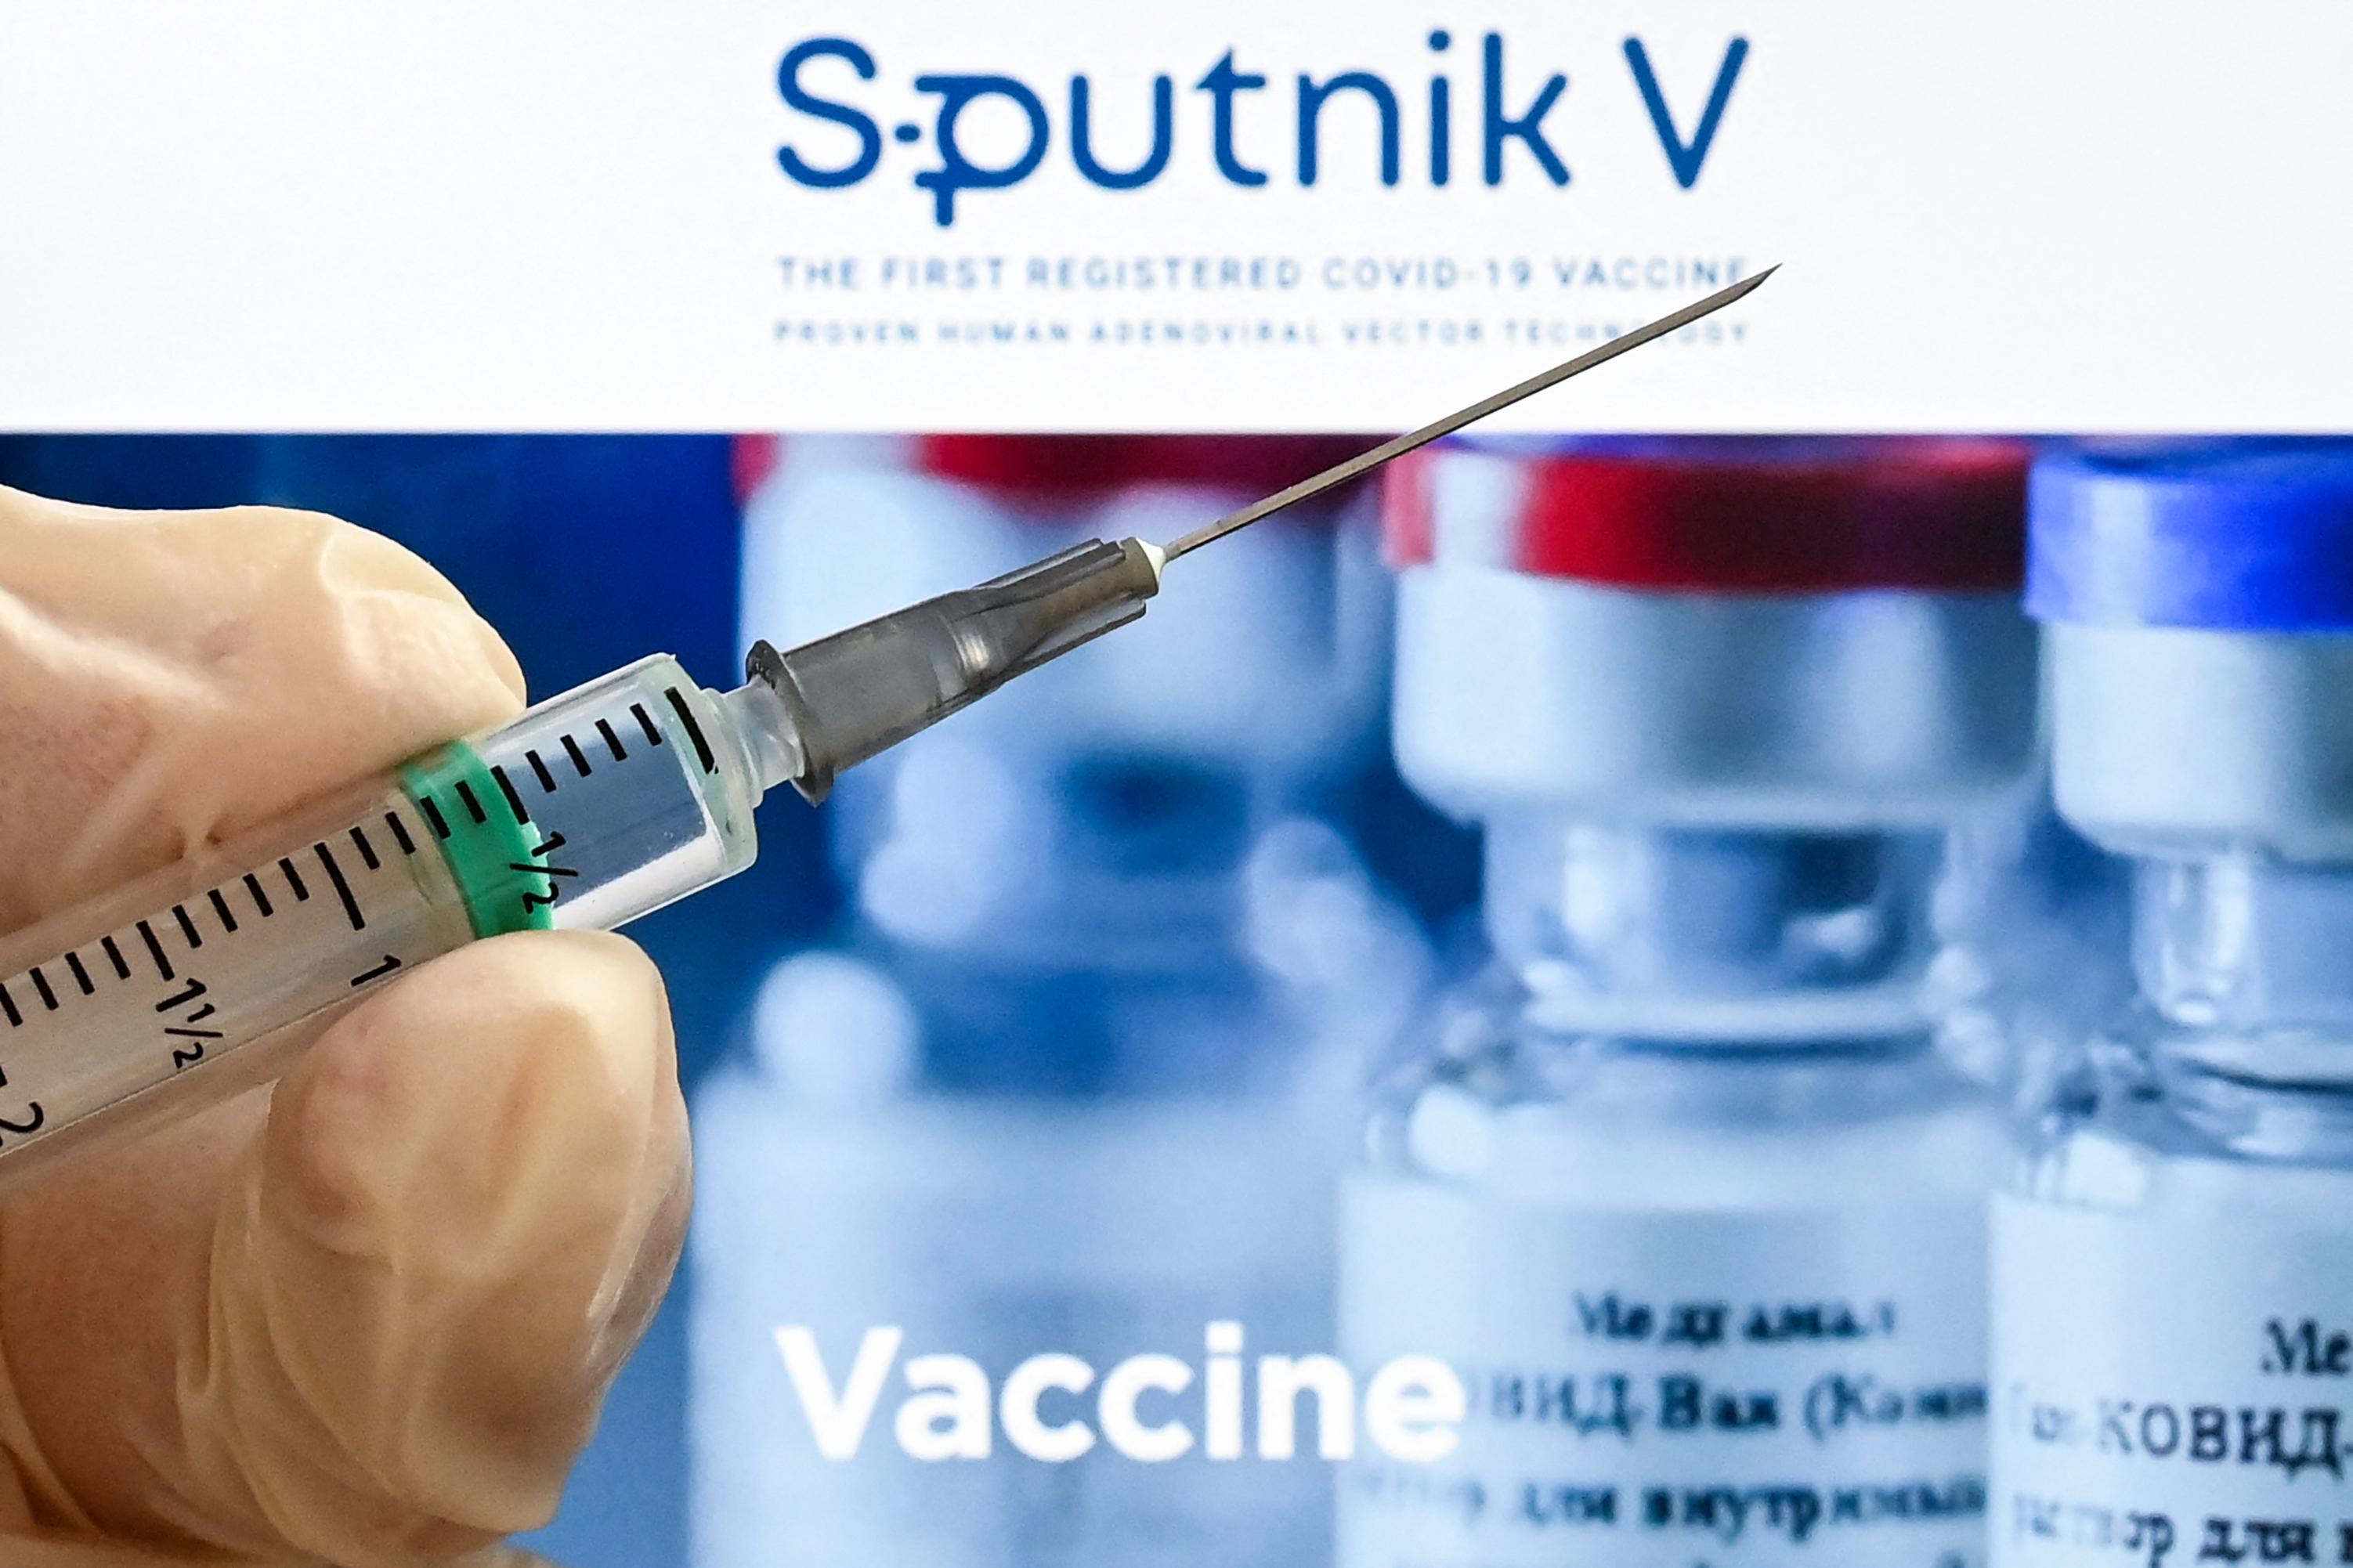 Gaza to receive Russia's Sputnik V vaccine on Feb. 14: official